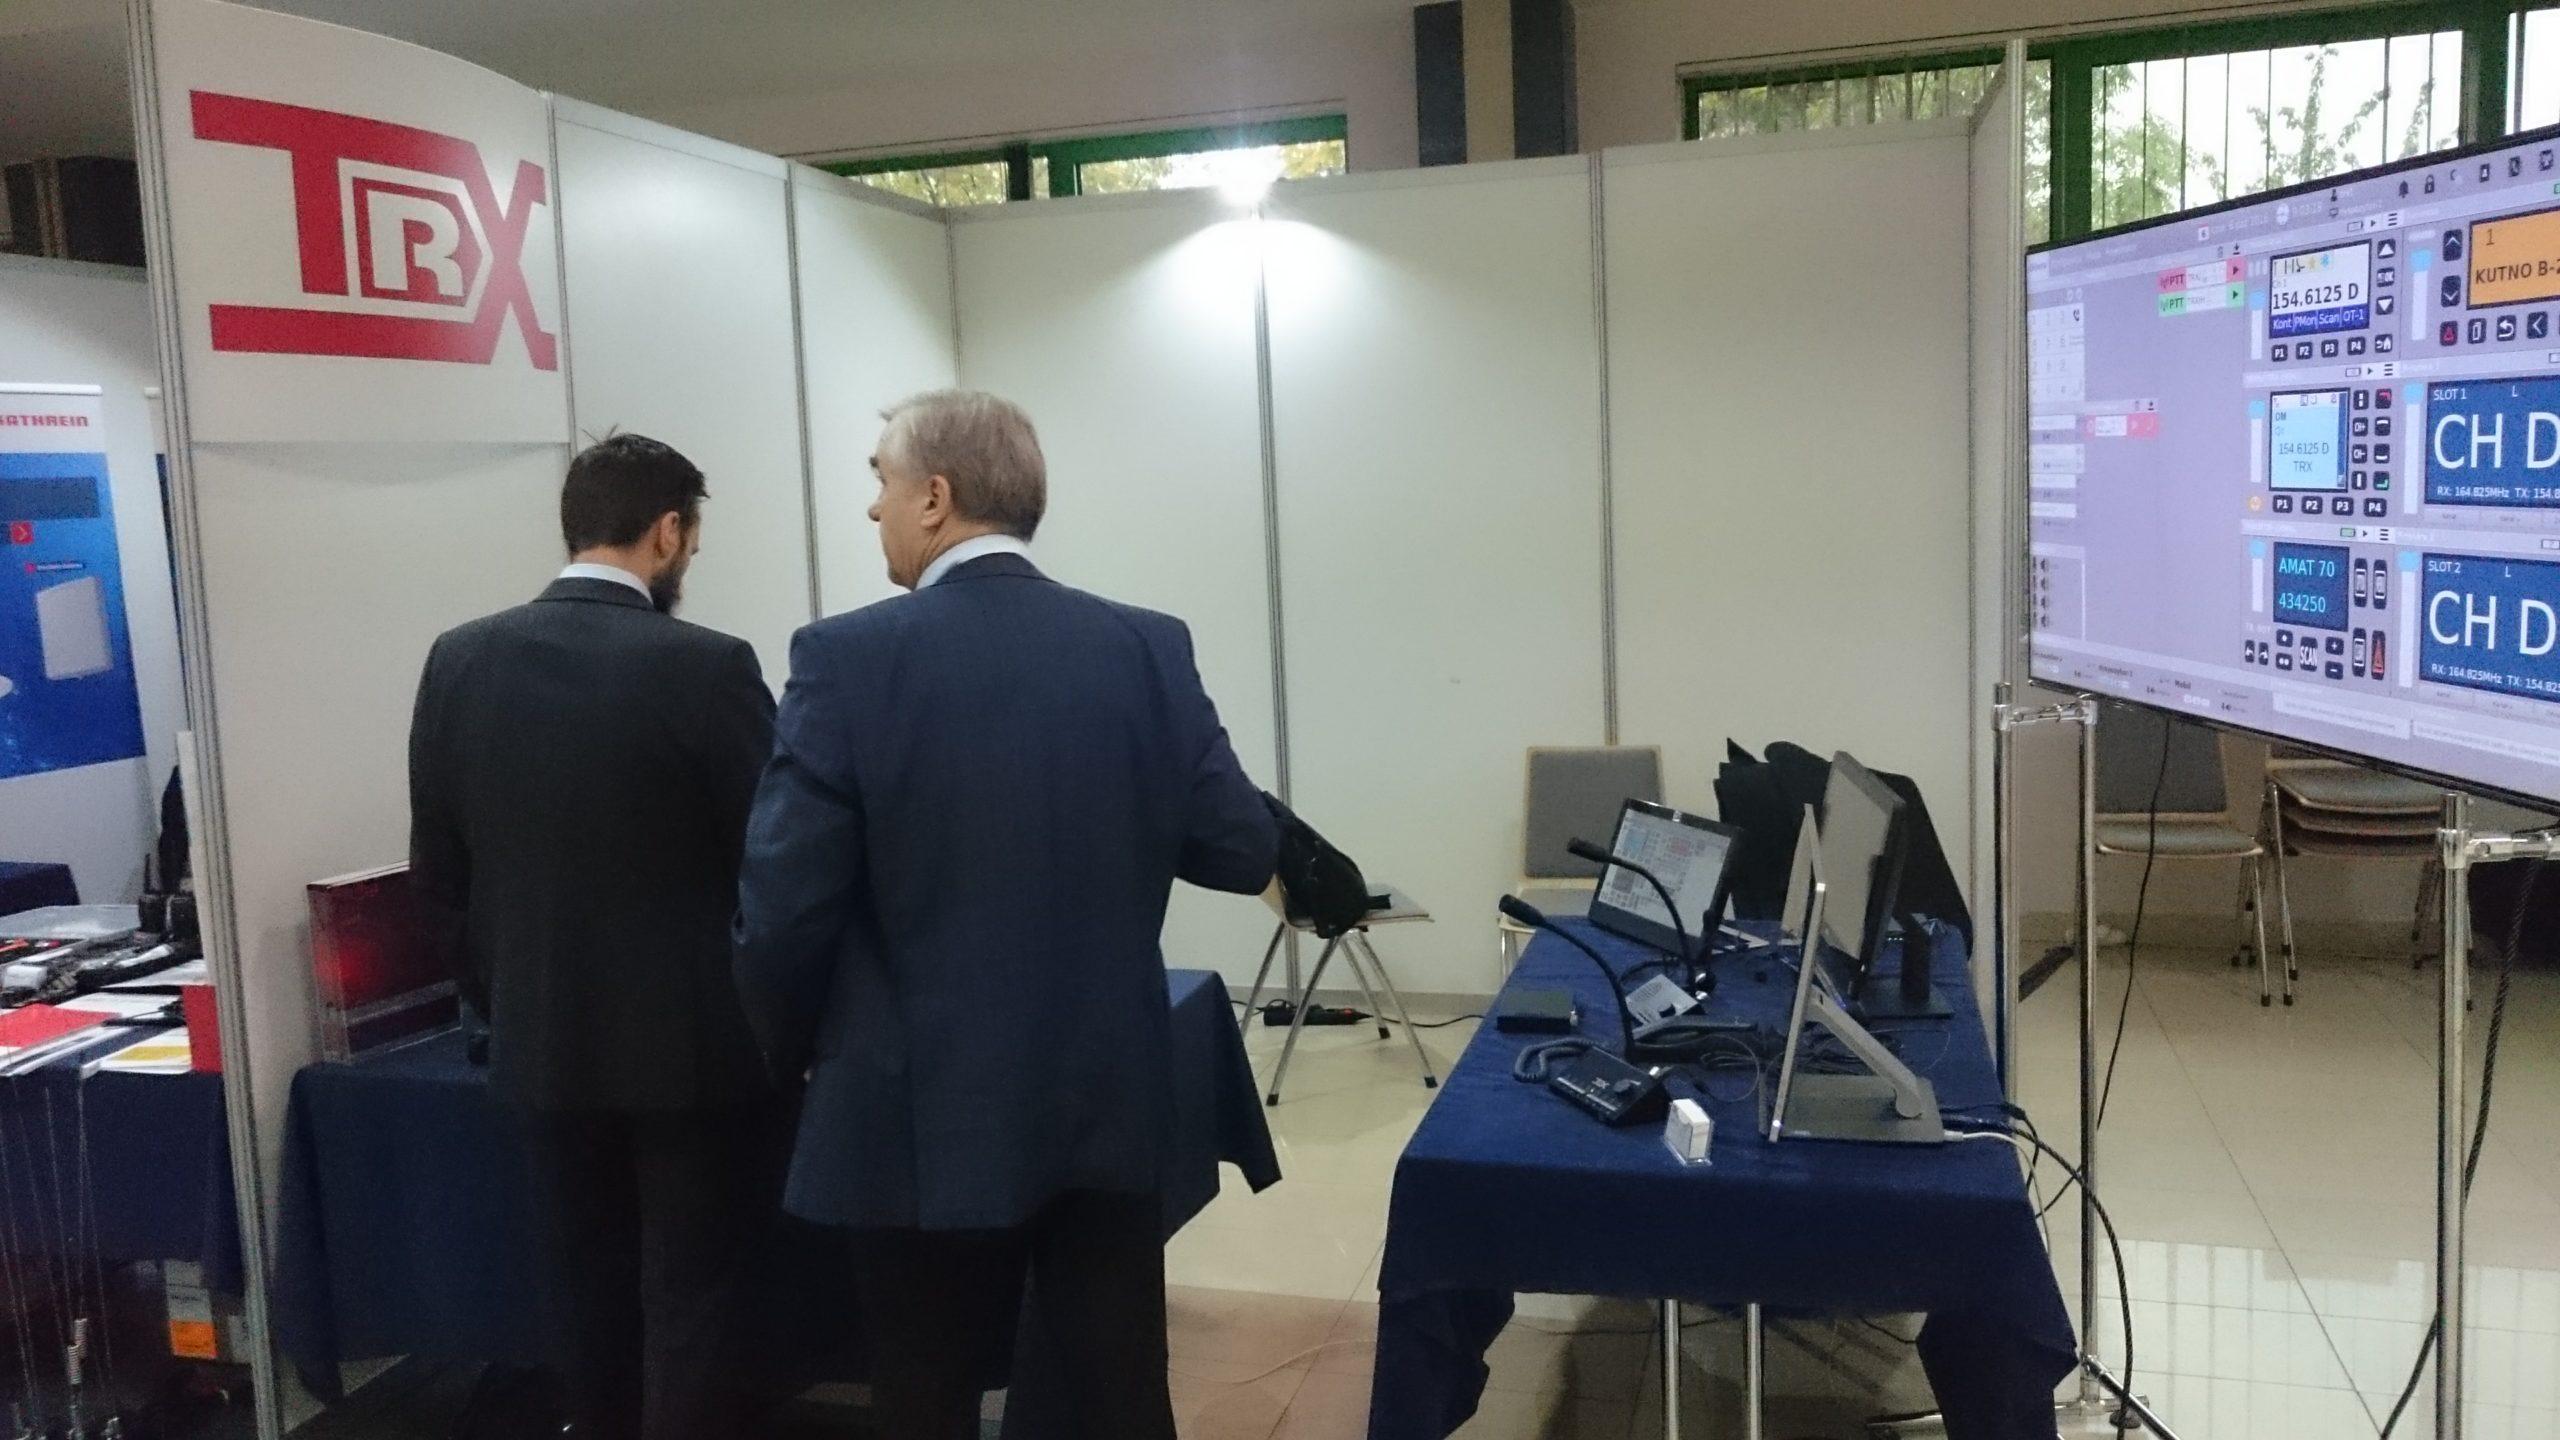 TRX RadioExpo 2016